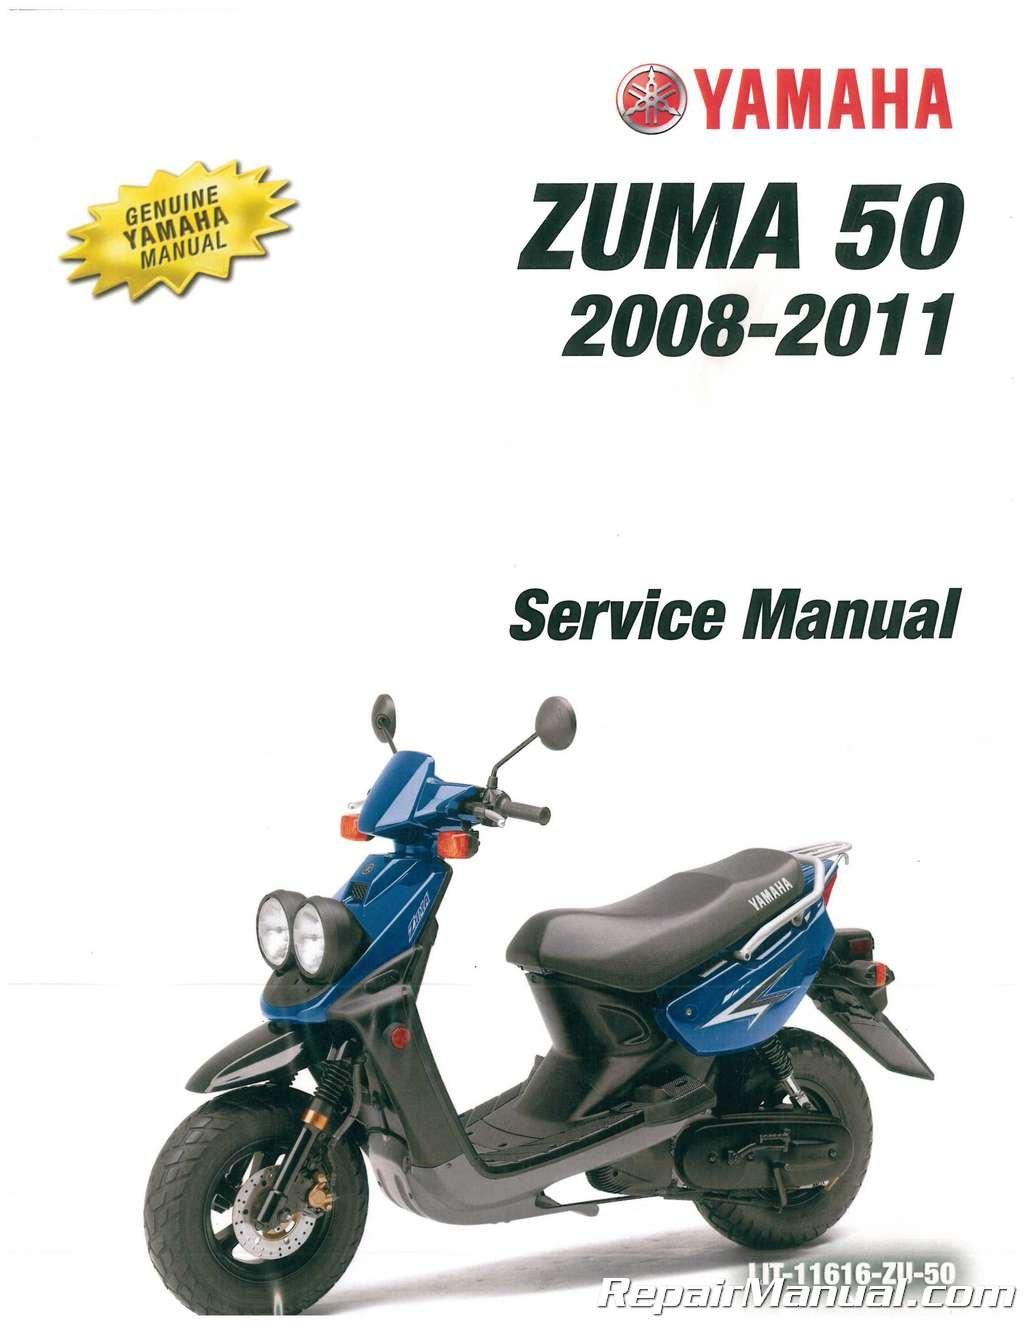 LIT-11616-ZU-50 2008-2011 Yamaha YW50 Zuma Scooter Service Manual by by Publisher